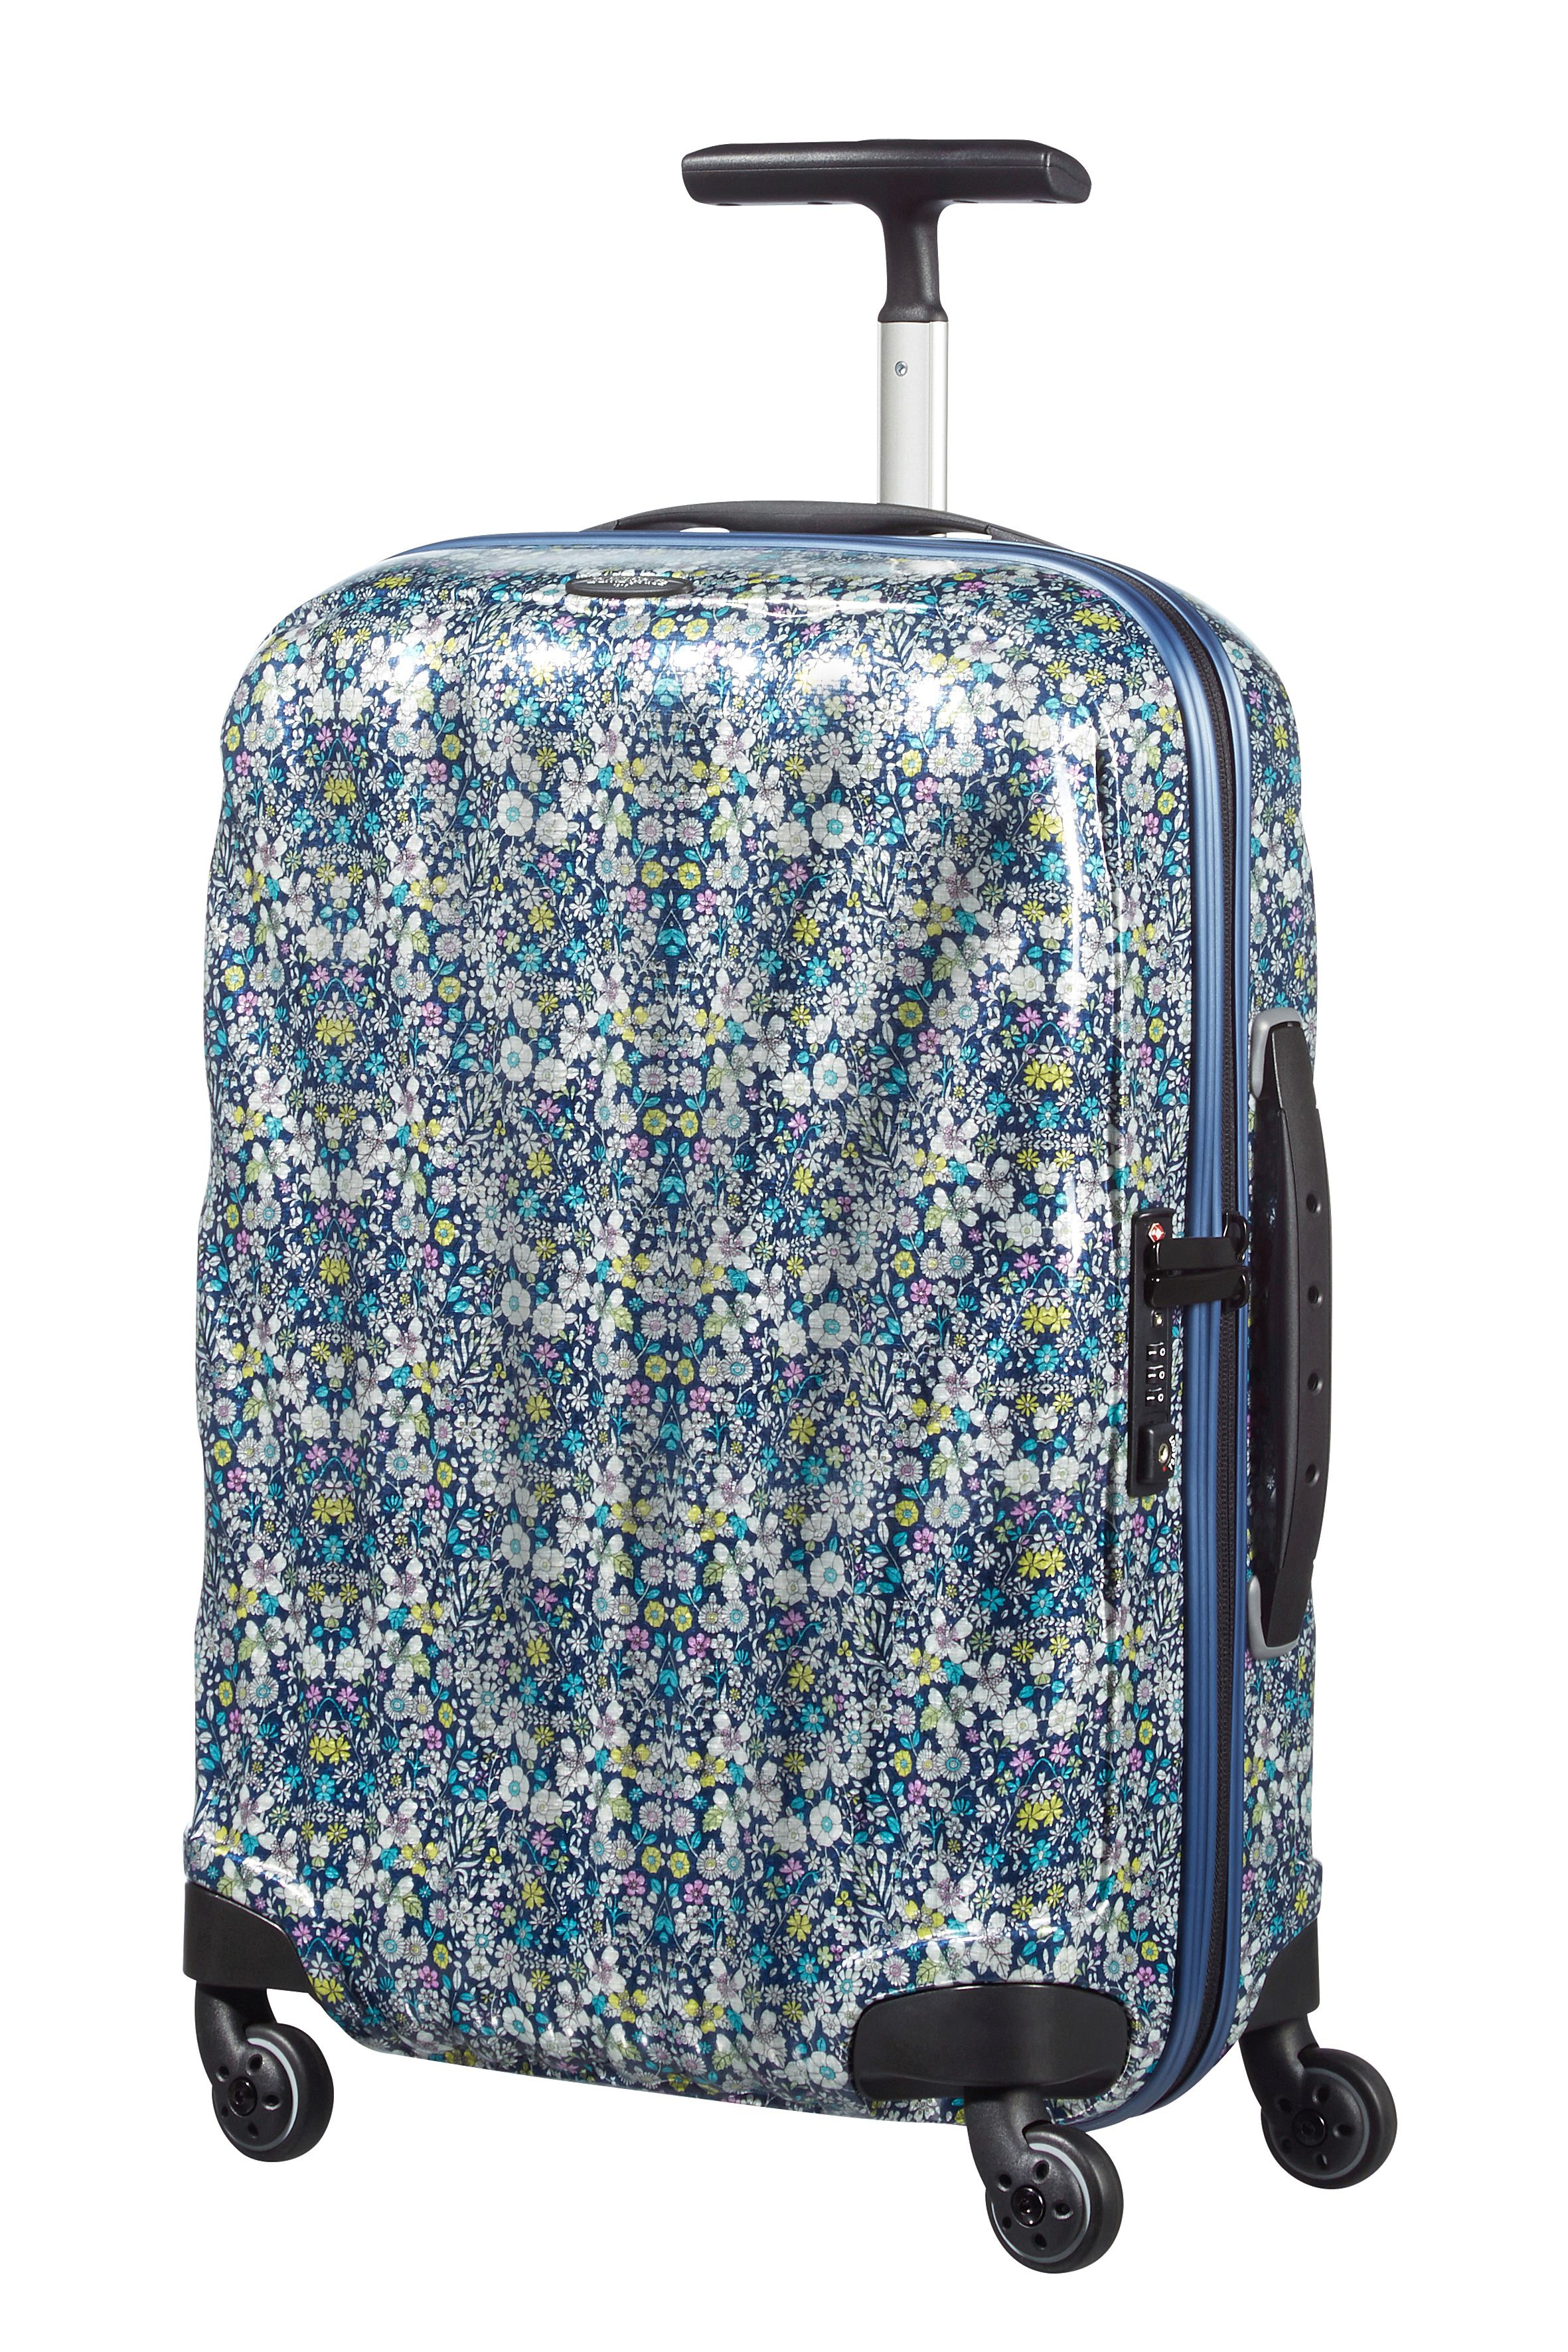 Samsonite Cosmolite 4 Wheel Liberty Print Large Suitcase